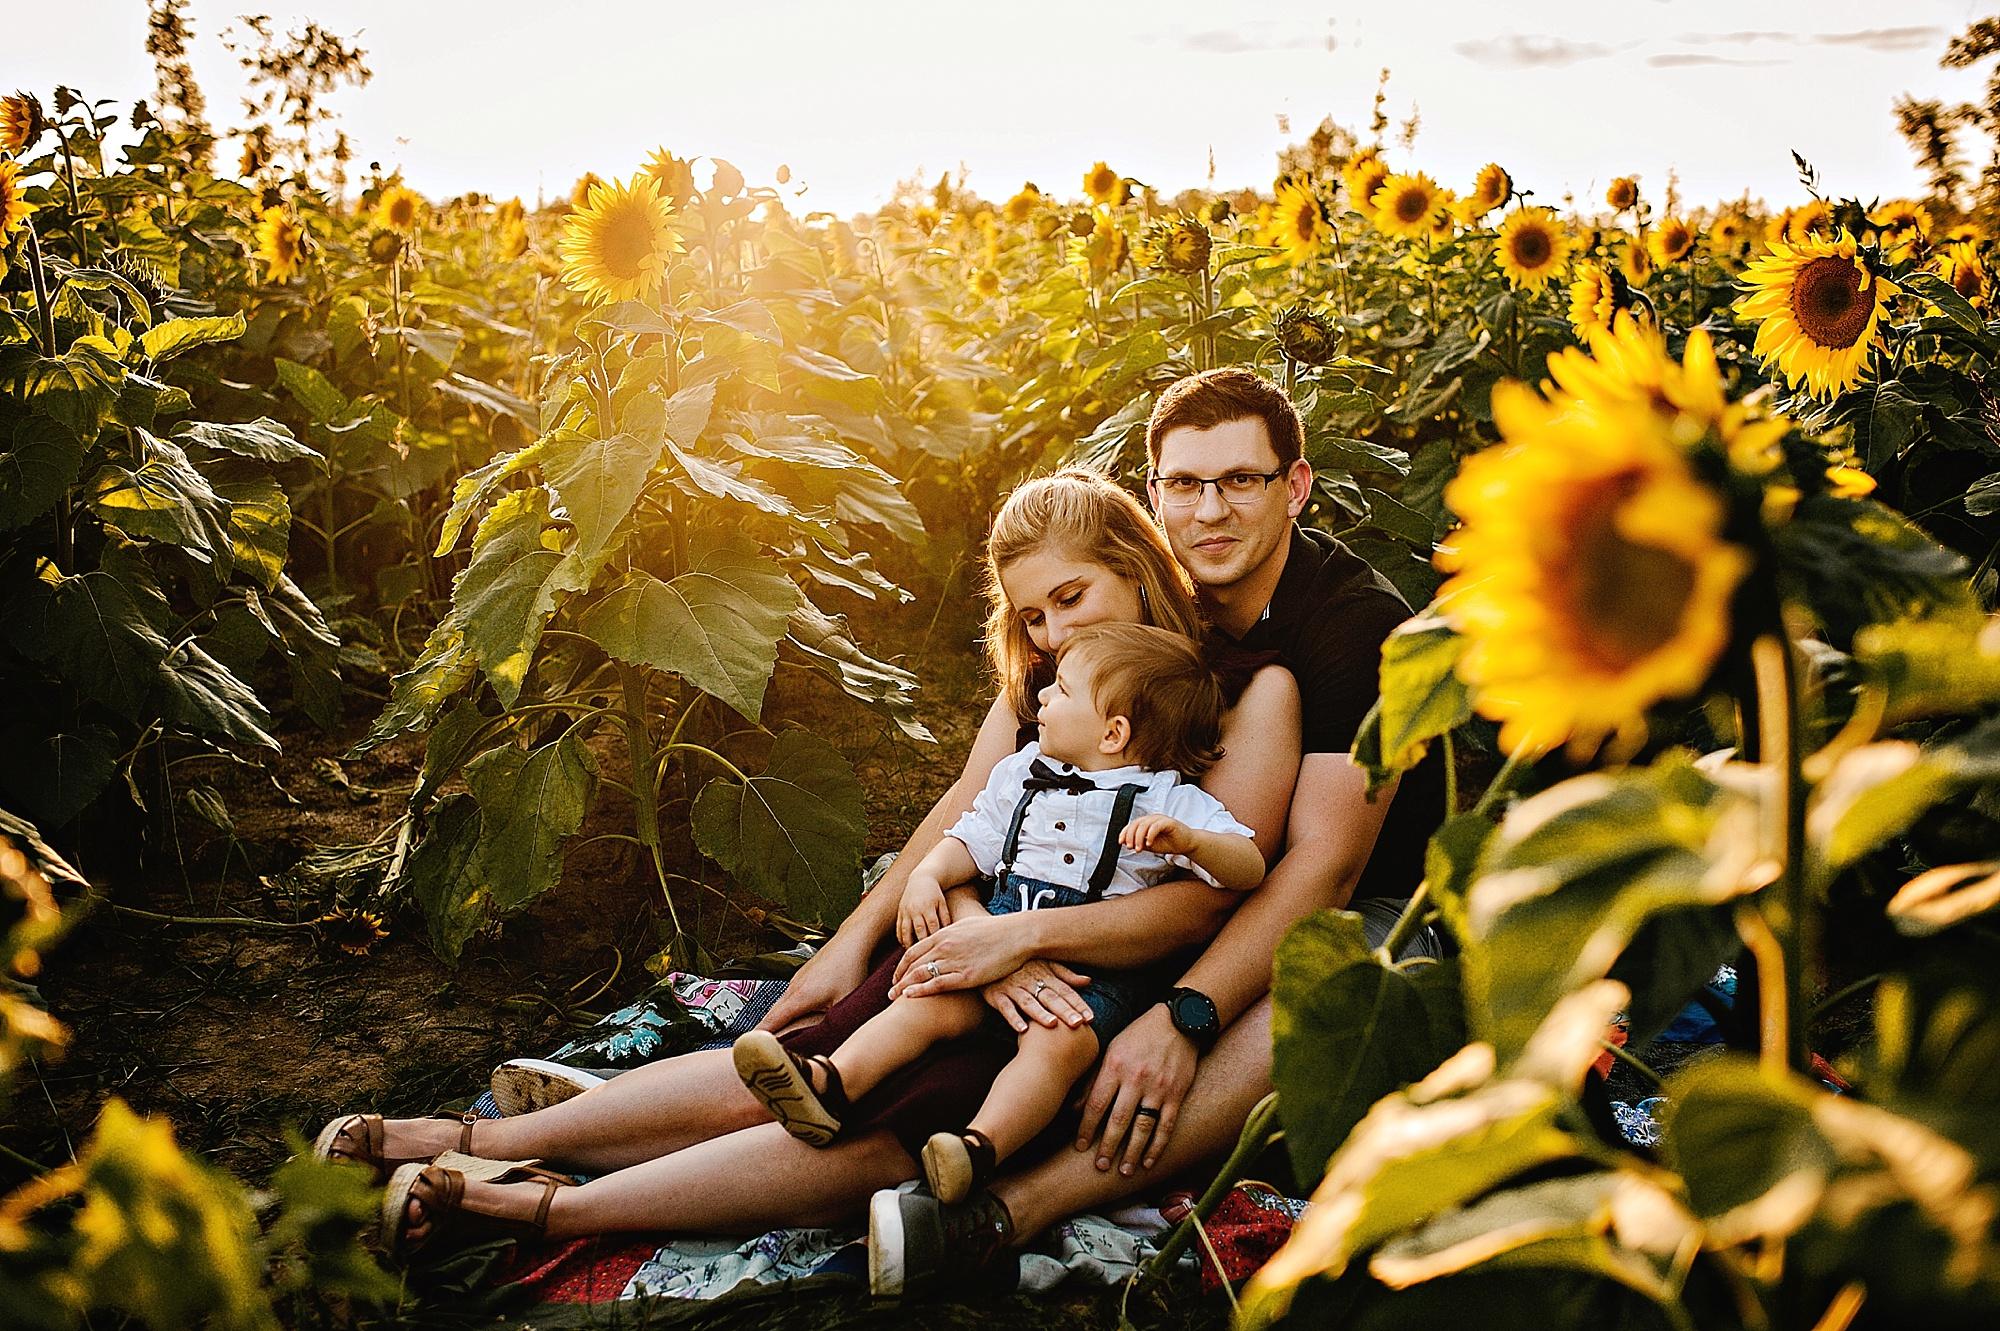 Schreiner-family-lauren-grayson-cleveland-photographer-sunflower-field-session_0013.jpg